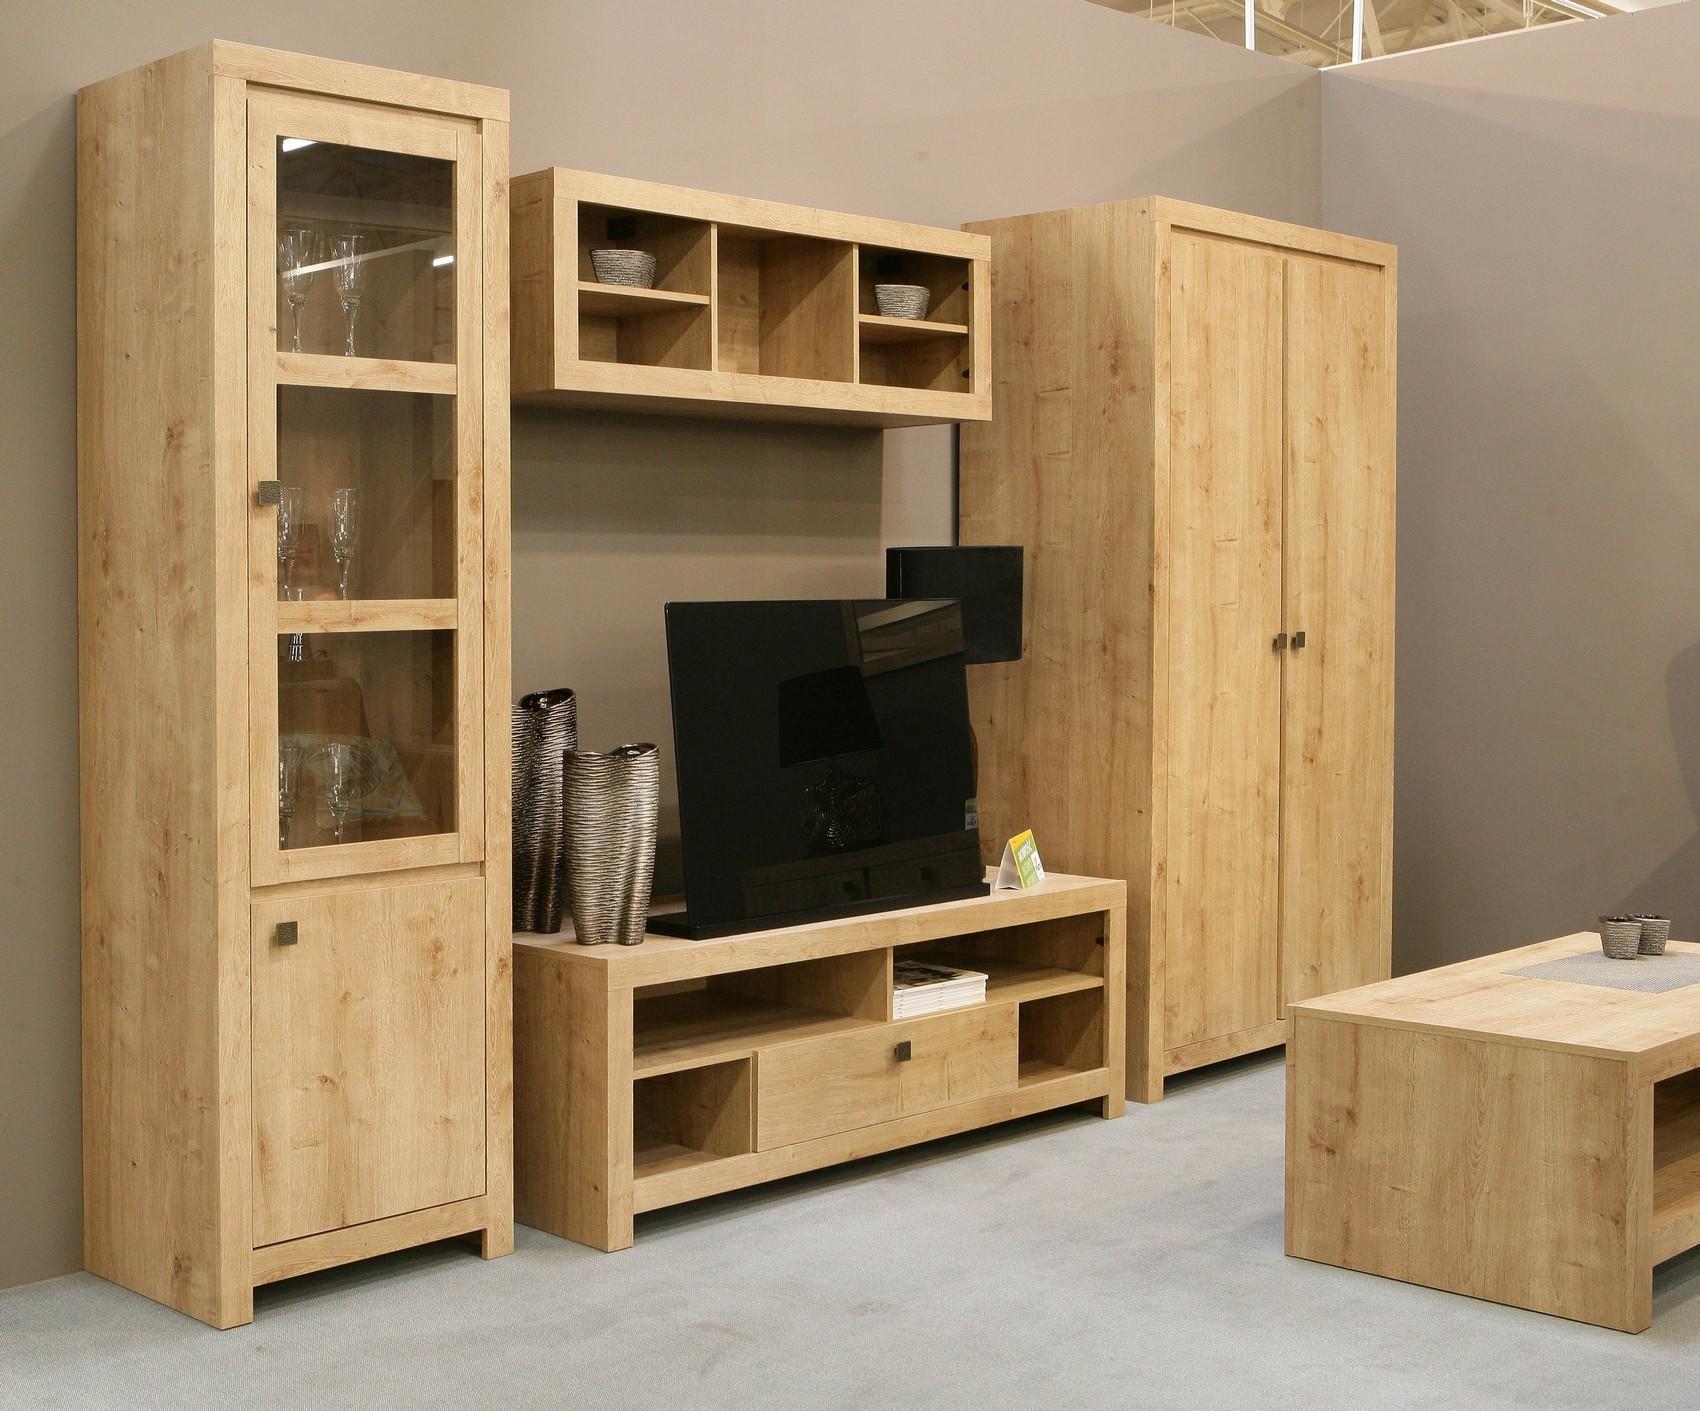 moebel24 pl kommode indigo neue farbe eiche ebay. Black Bedroom Furniture Sets. Home Design Ideas